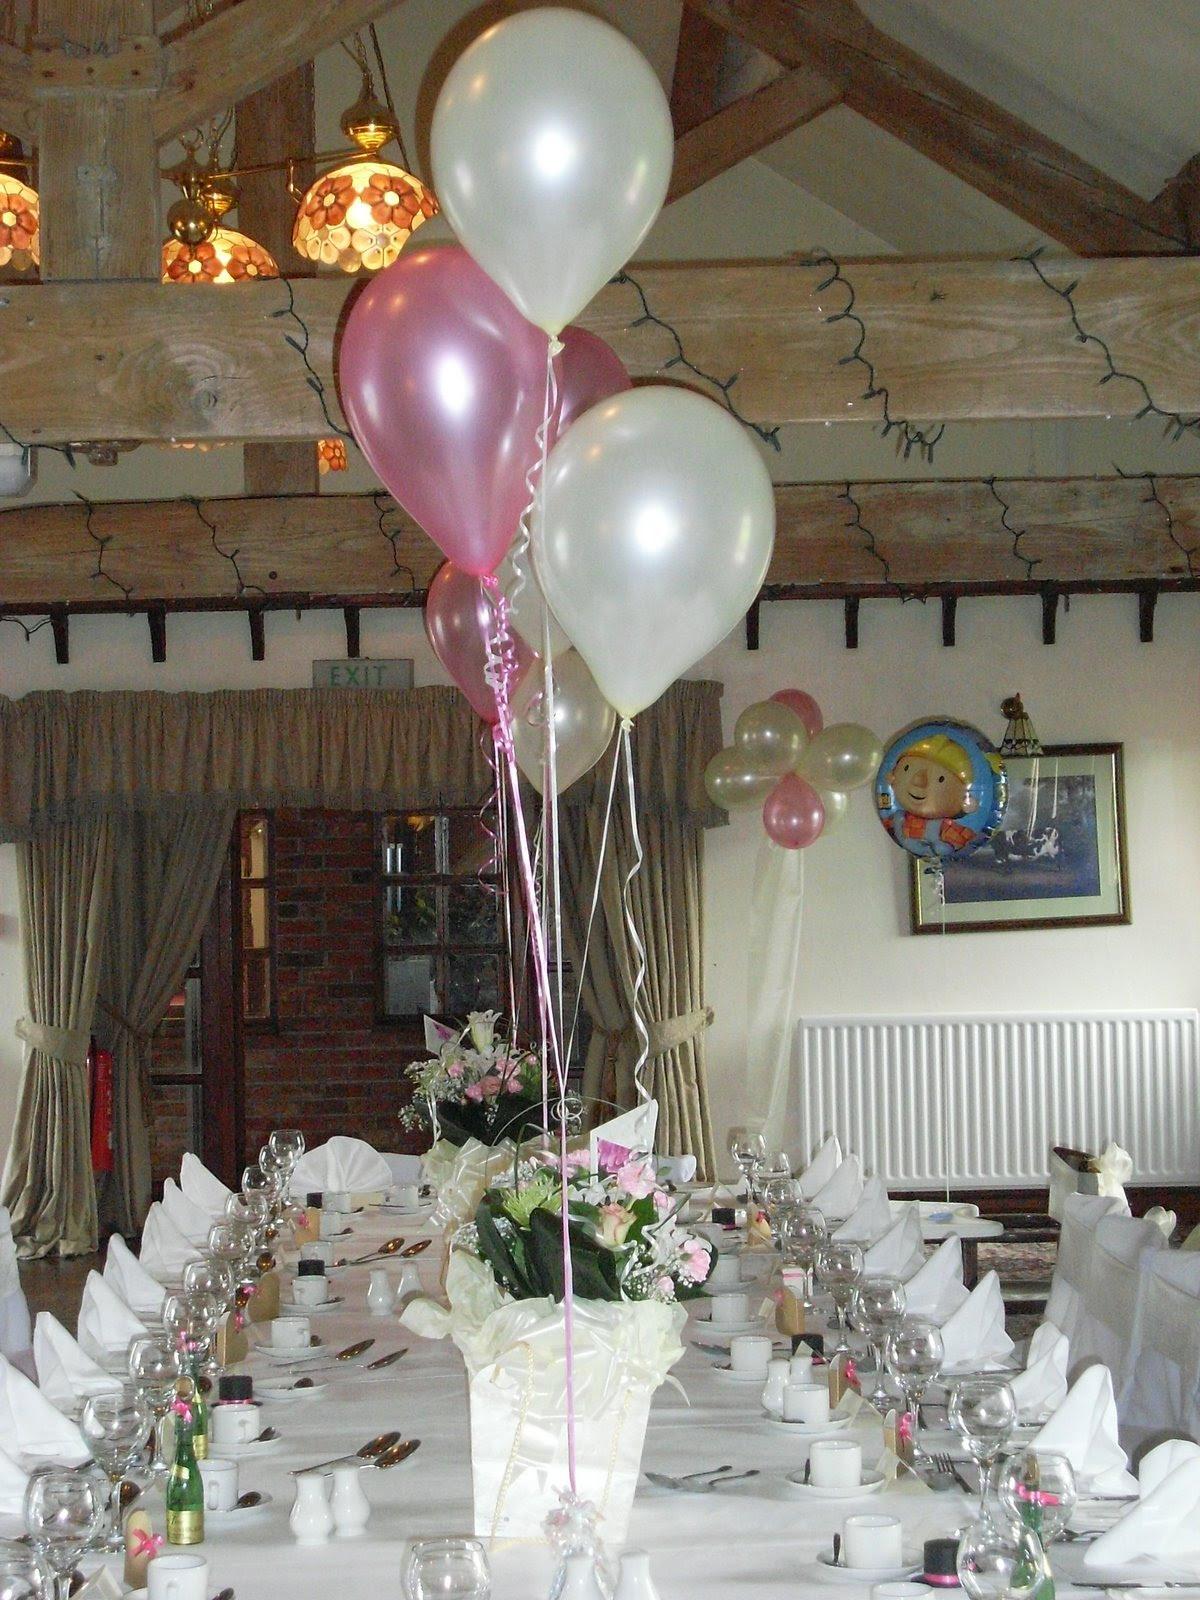 Balloon Decorations | Decoration Ideas